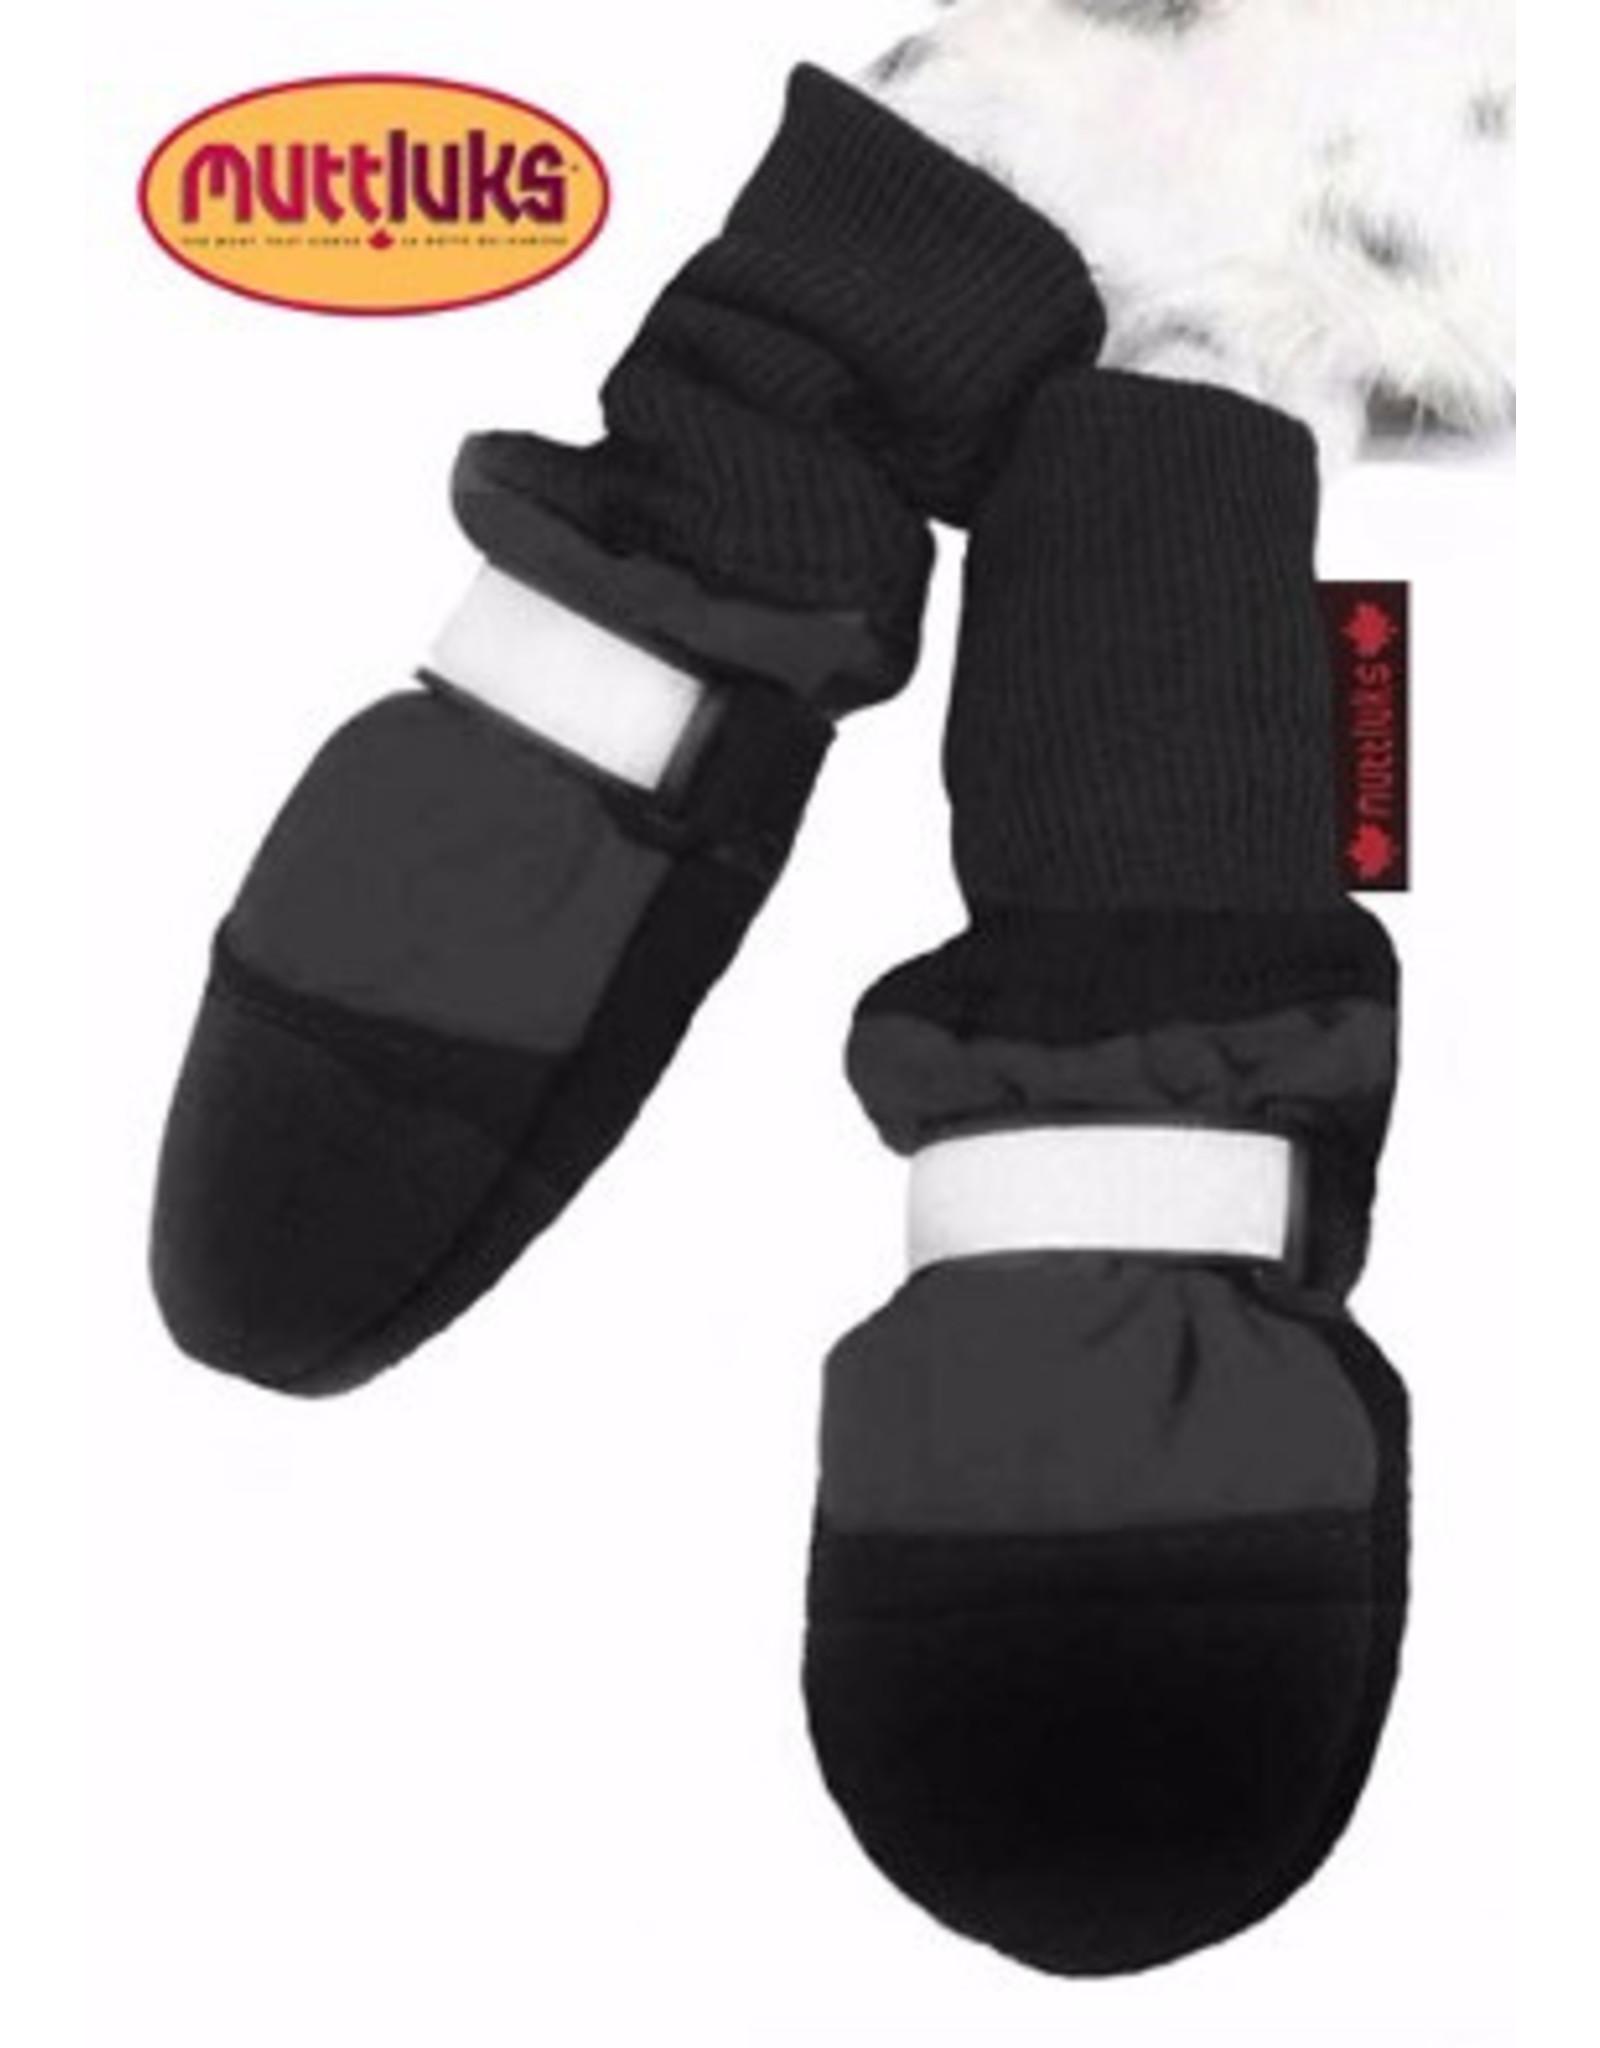 Muttluks Muttluks Black sm Boots Fleece  Lined EA